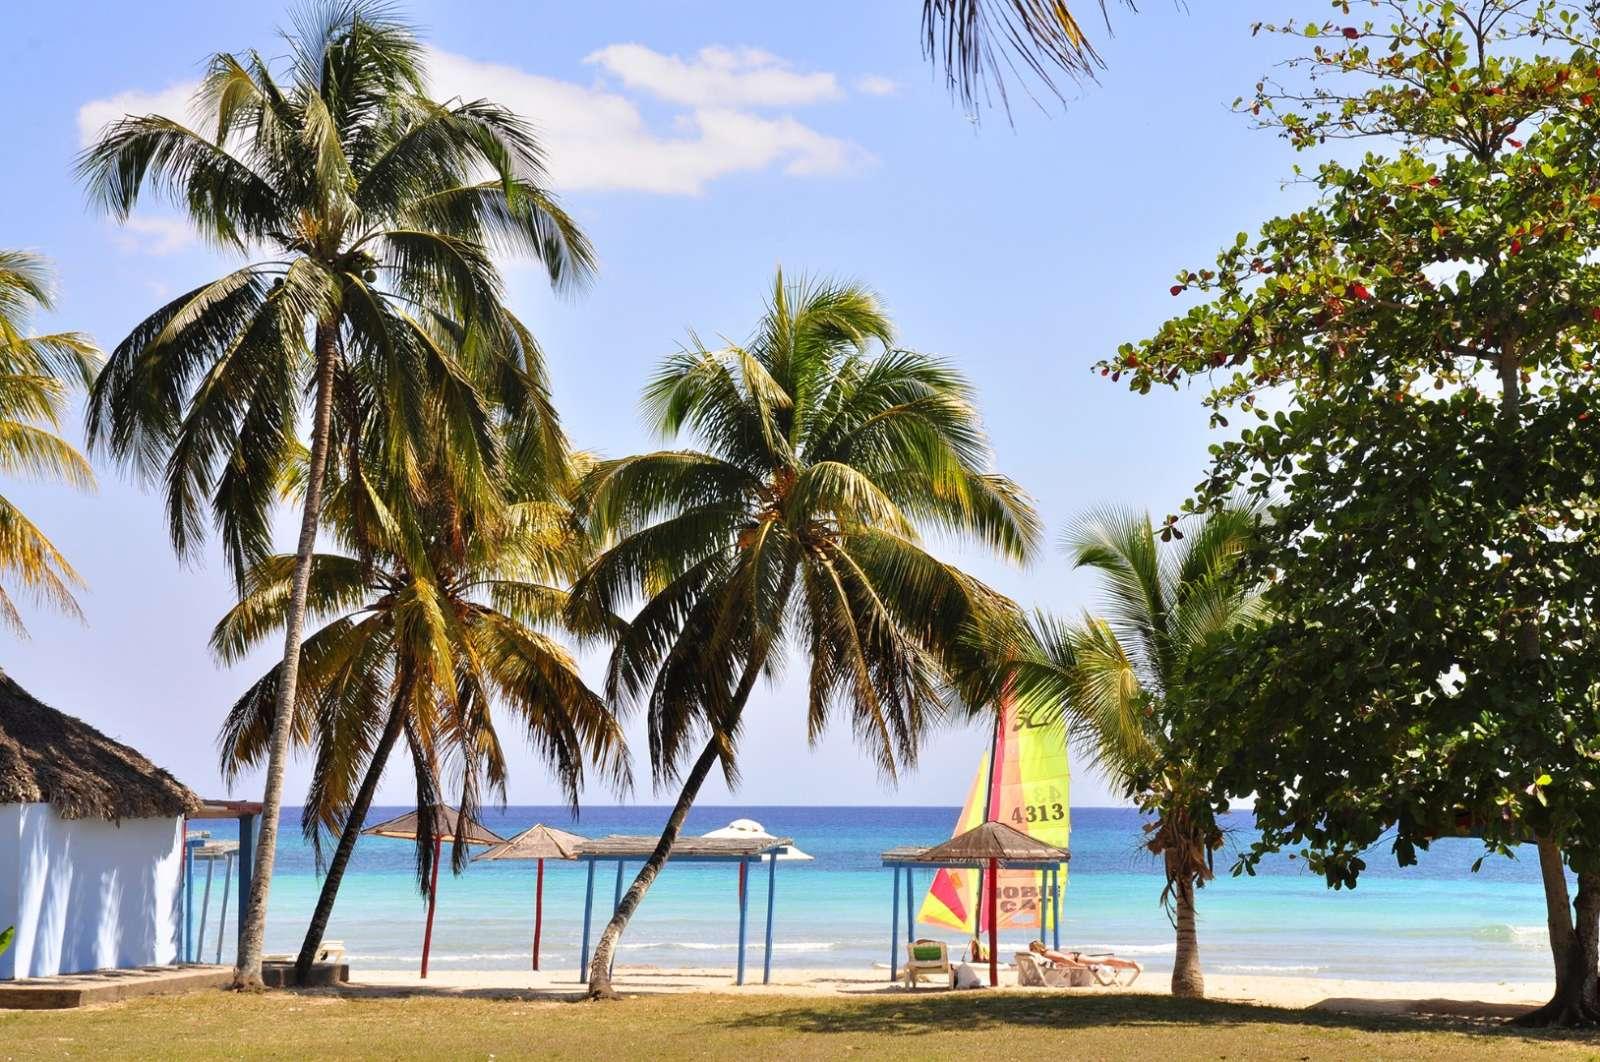 Beach through palm trees at Hotel Playa Larga